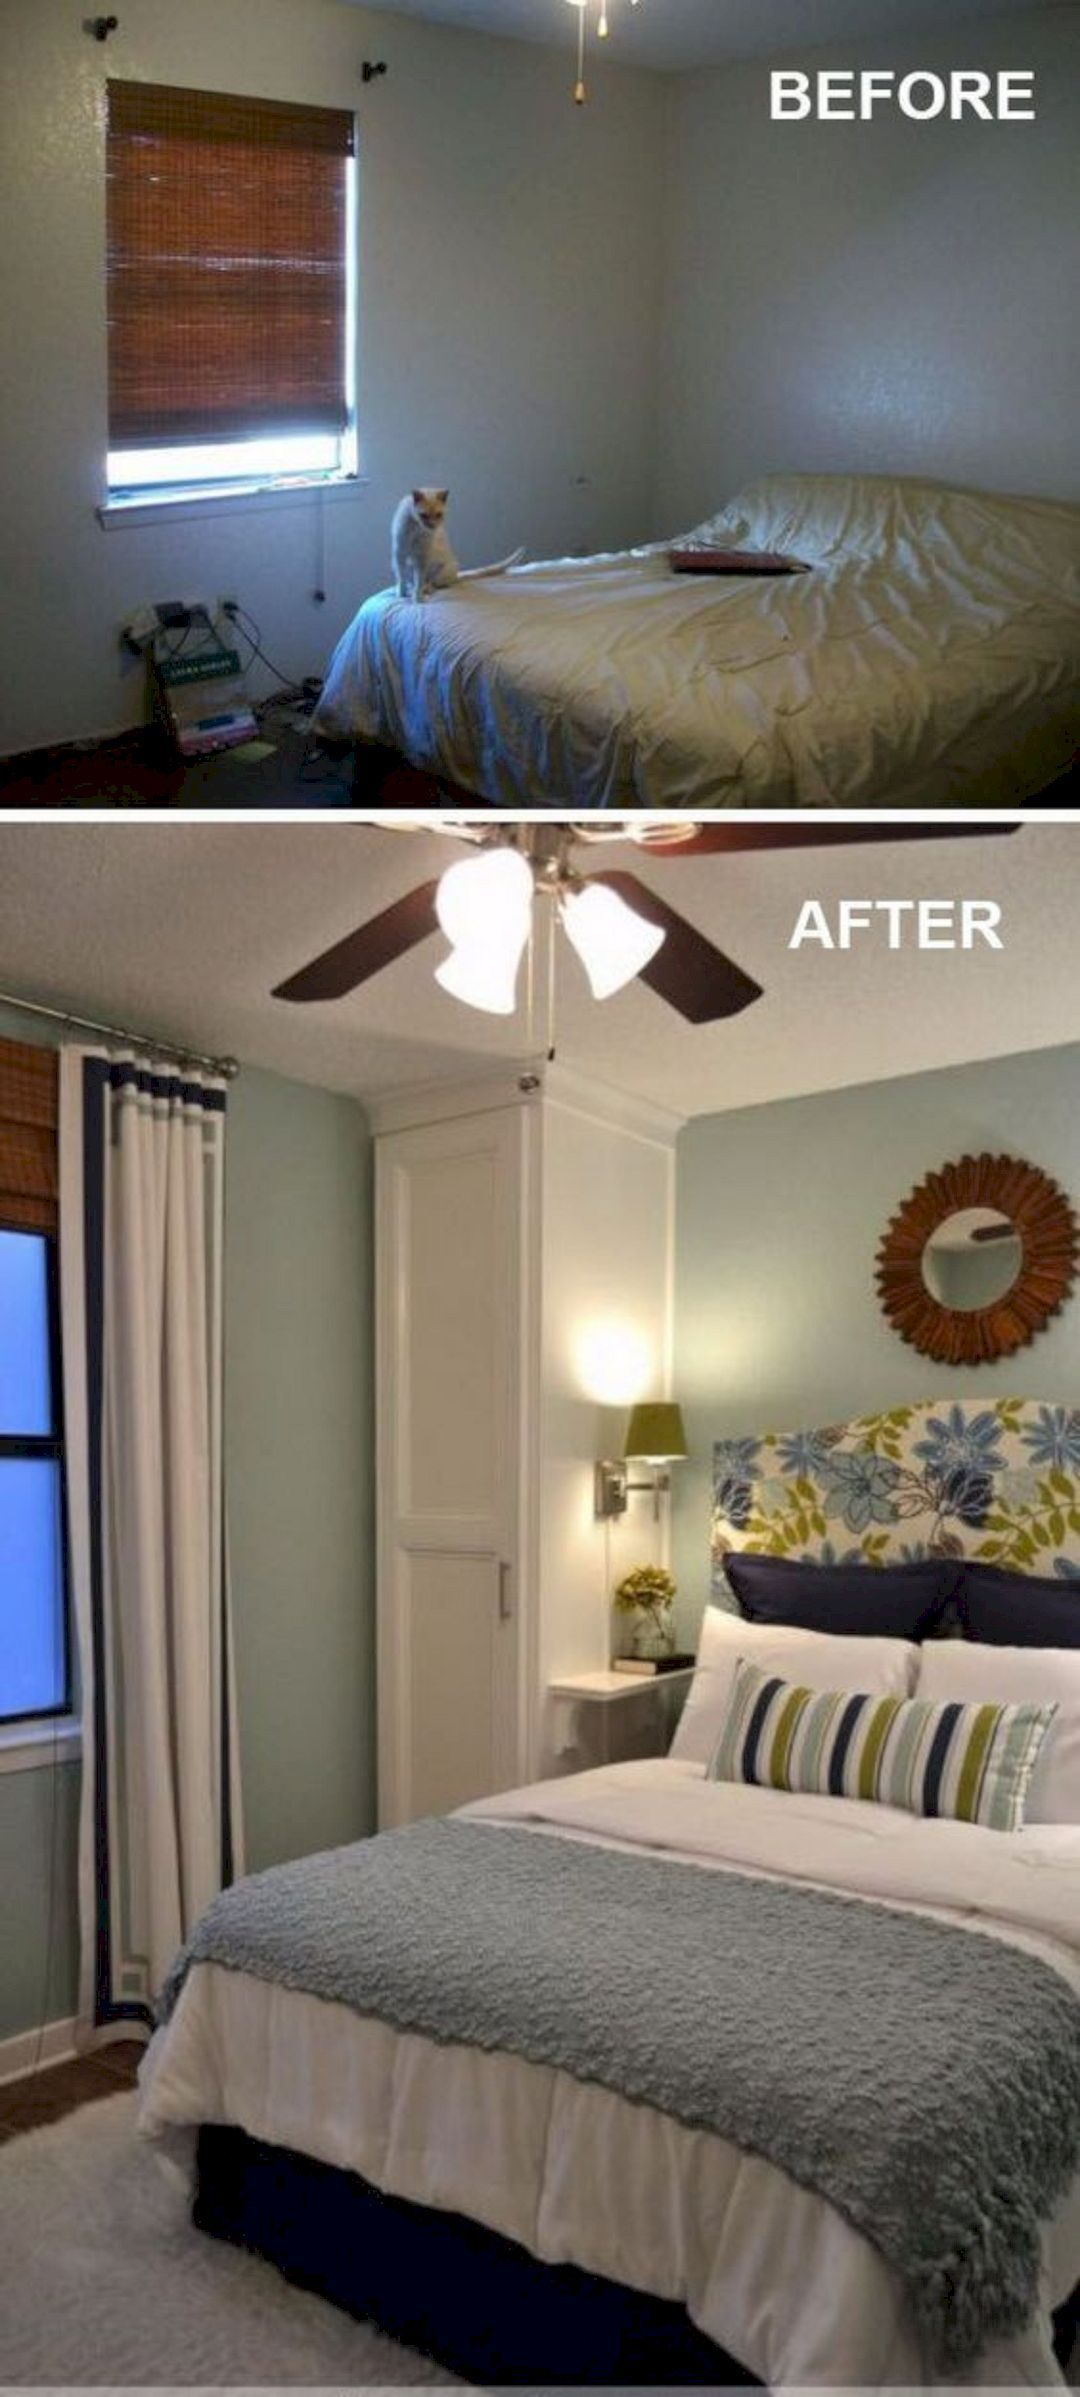 17 Stunning Diy Bedroom Storage Ideas Small Master Bedroom Remodel Bedroom Master Bedrooms Decor